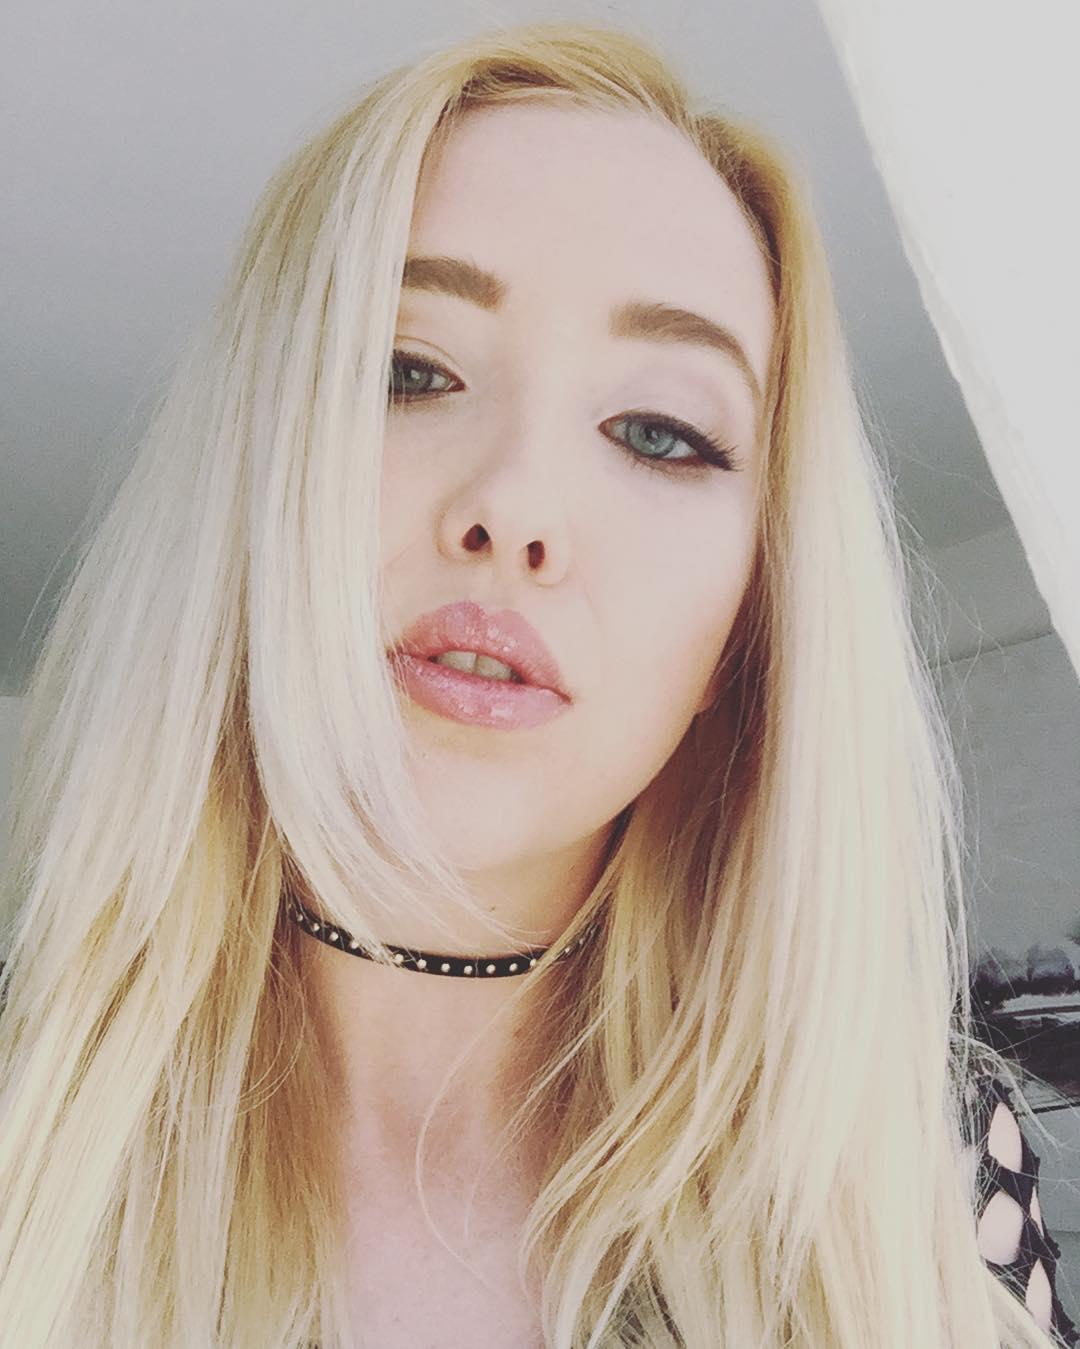 Samantha Rone Instagram username